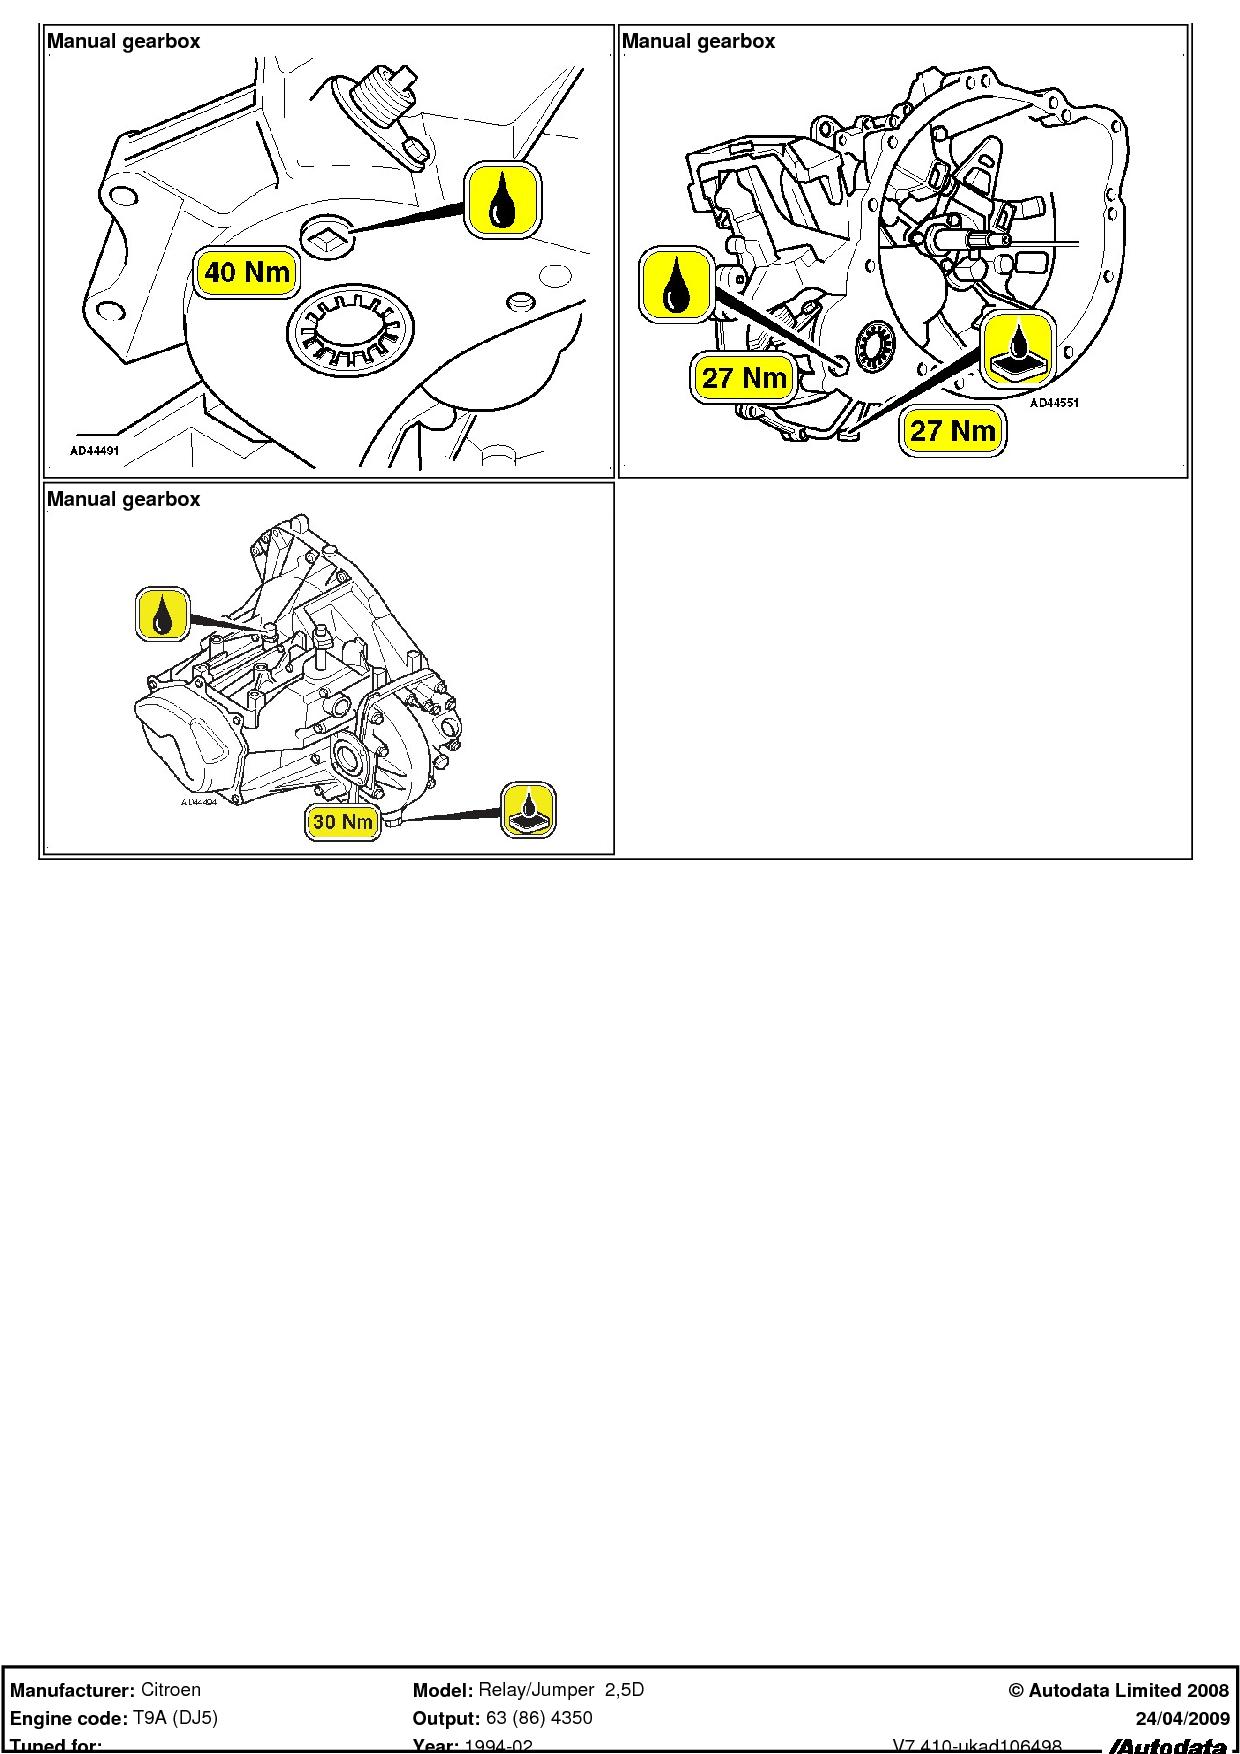 Citroen Transmission Diagrams : Citroen transmission diagrams wiring diagram schemes